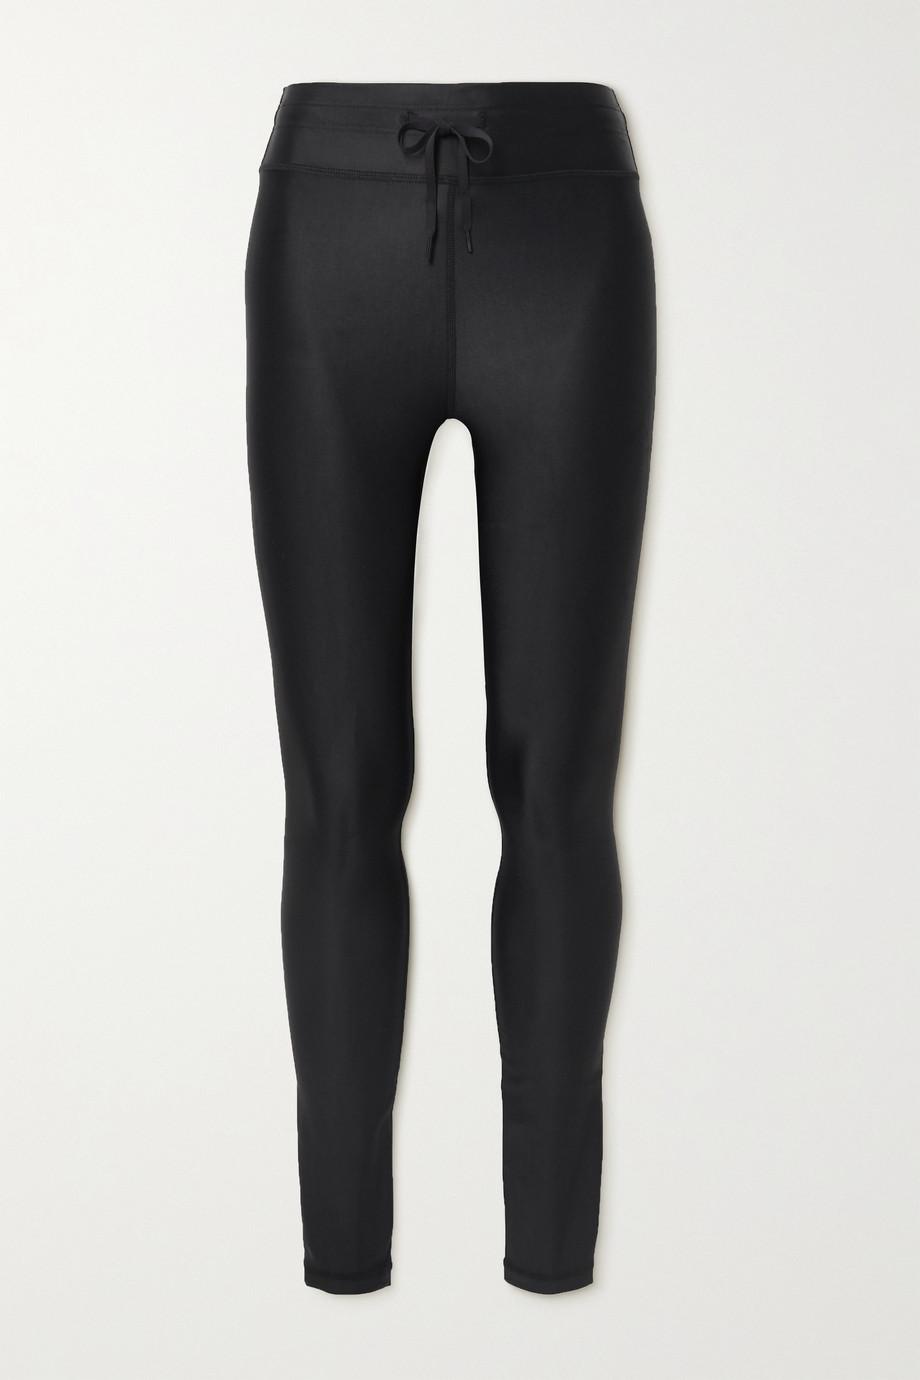 The Upside Yoga stretch leggings